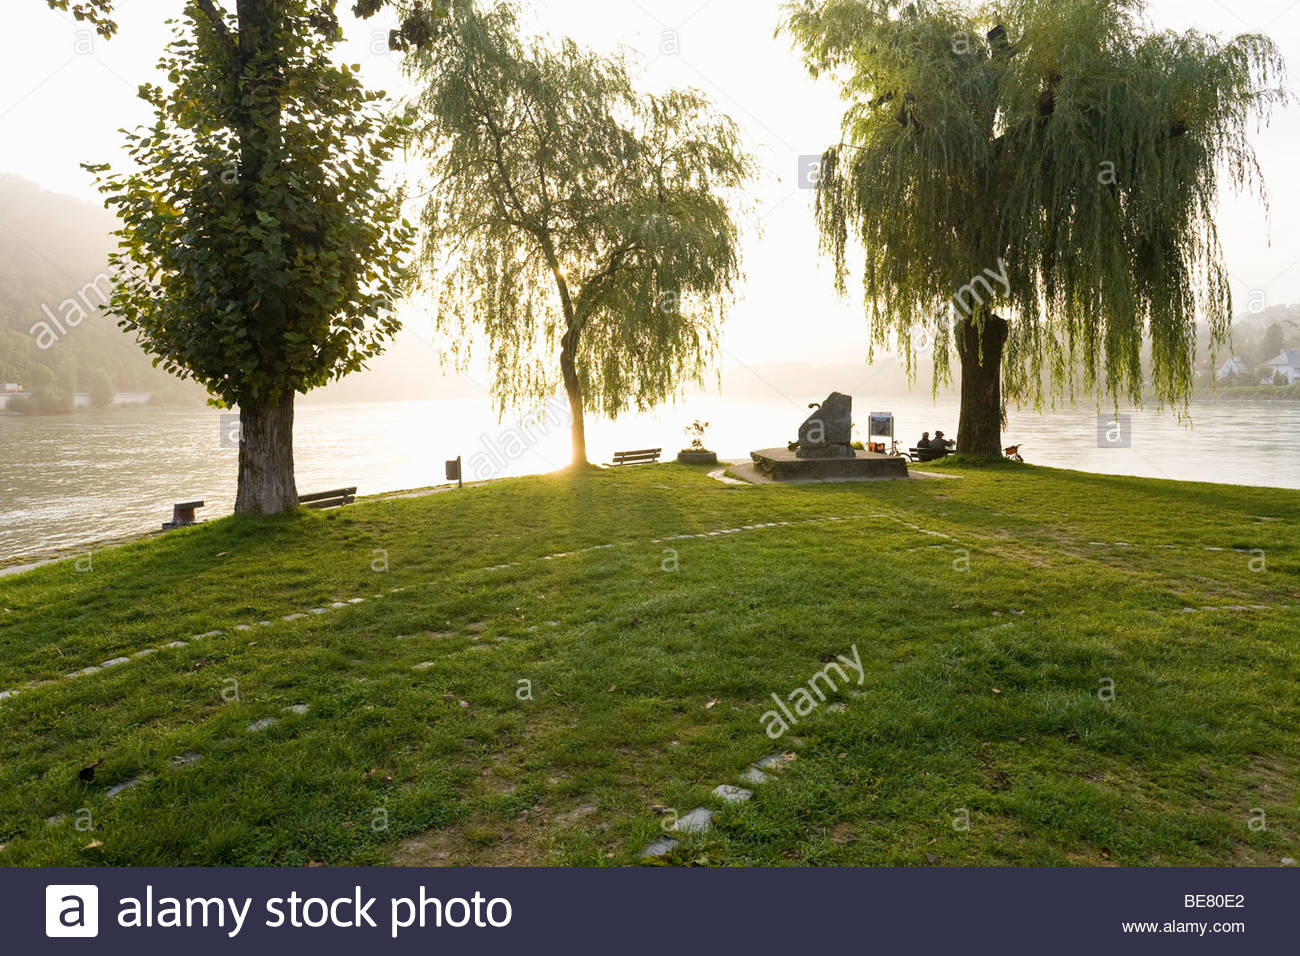 Place where the three rivers meet, the river Inn, Danube and Ilz, Passau, Bavaria, Germany - Stock Image